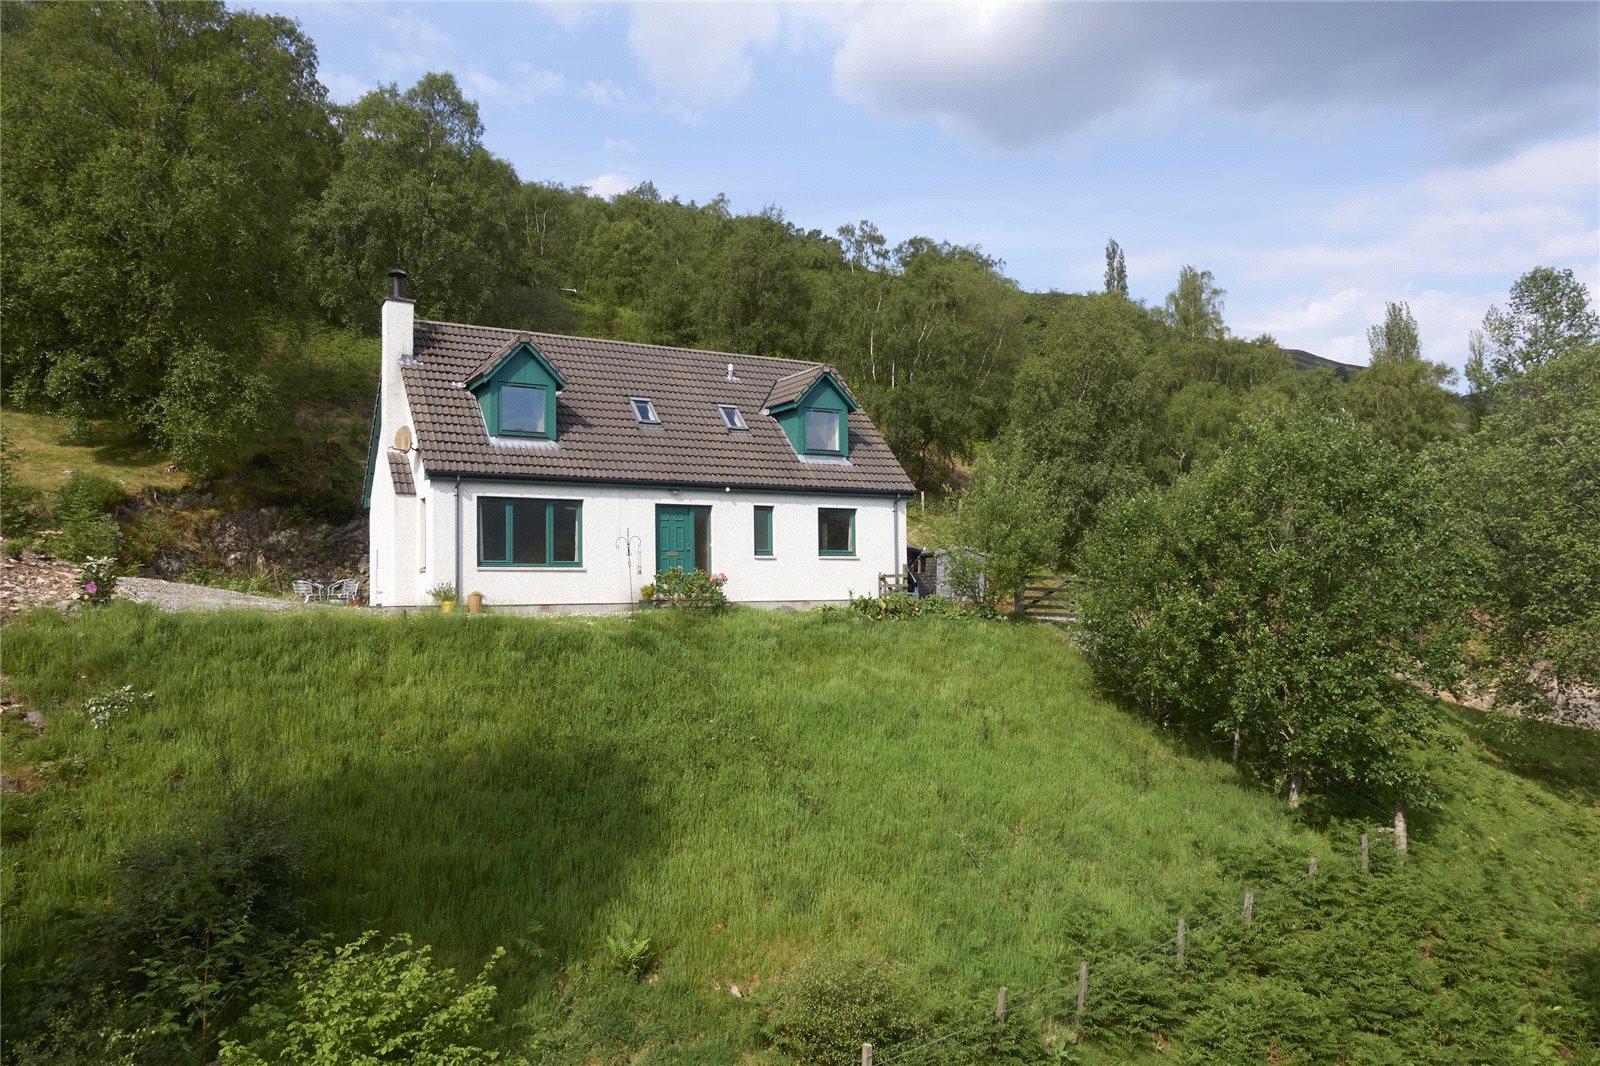 3 Bedrooms Detached House for sale in Rivington, Letters, Lochbroom, Garve, IV23